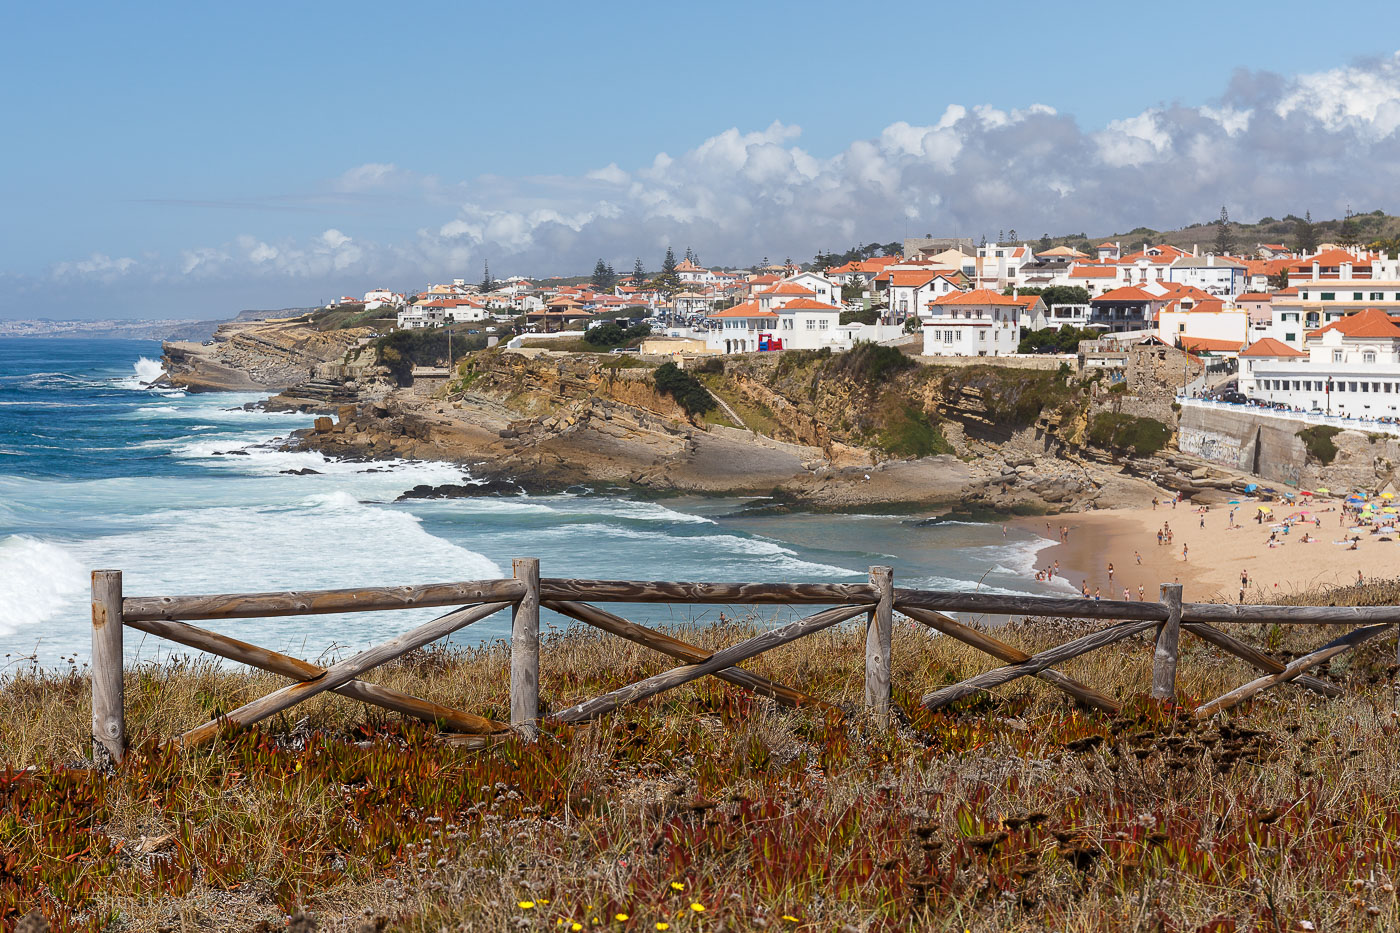 Фото № 5. Прайя даш Макаш. Поездка на отдых в Синтру. Впечатления от Португалии. Камера Canon EOS 6D с объективом Canon EF 24-70, 1/640, - 1, 9, 100, 61.